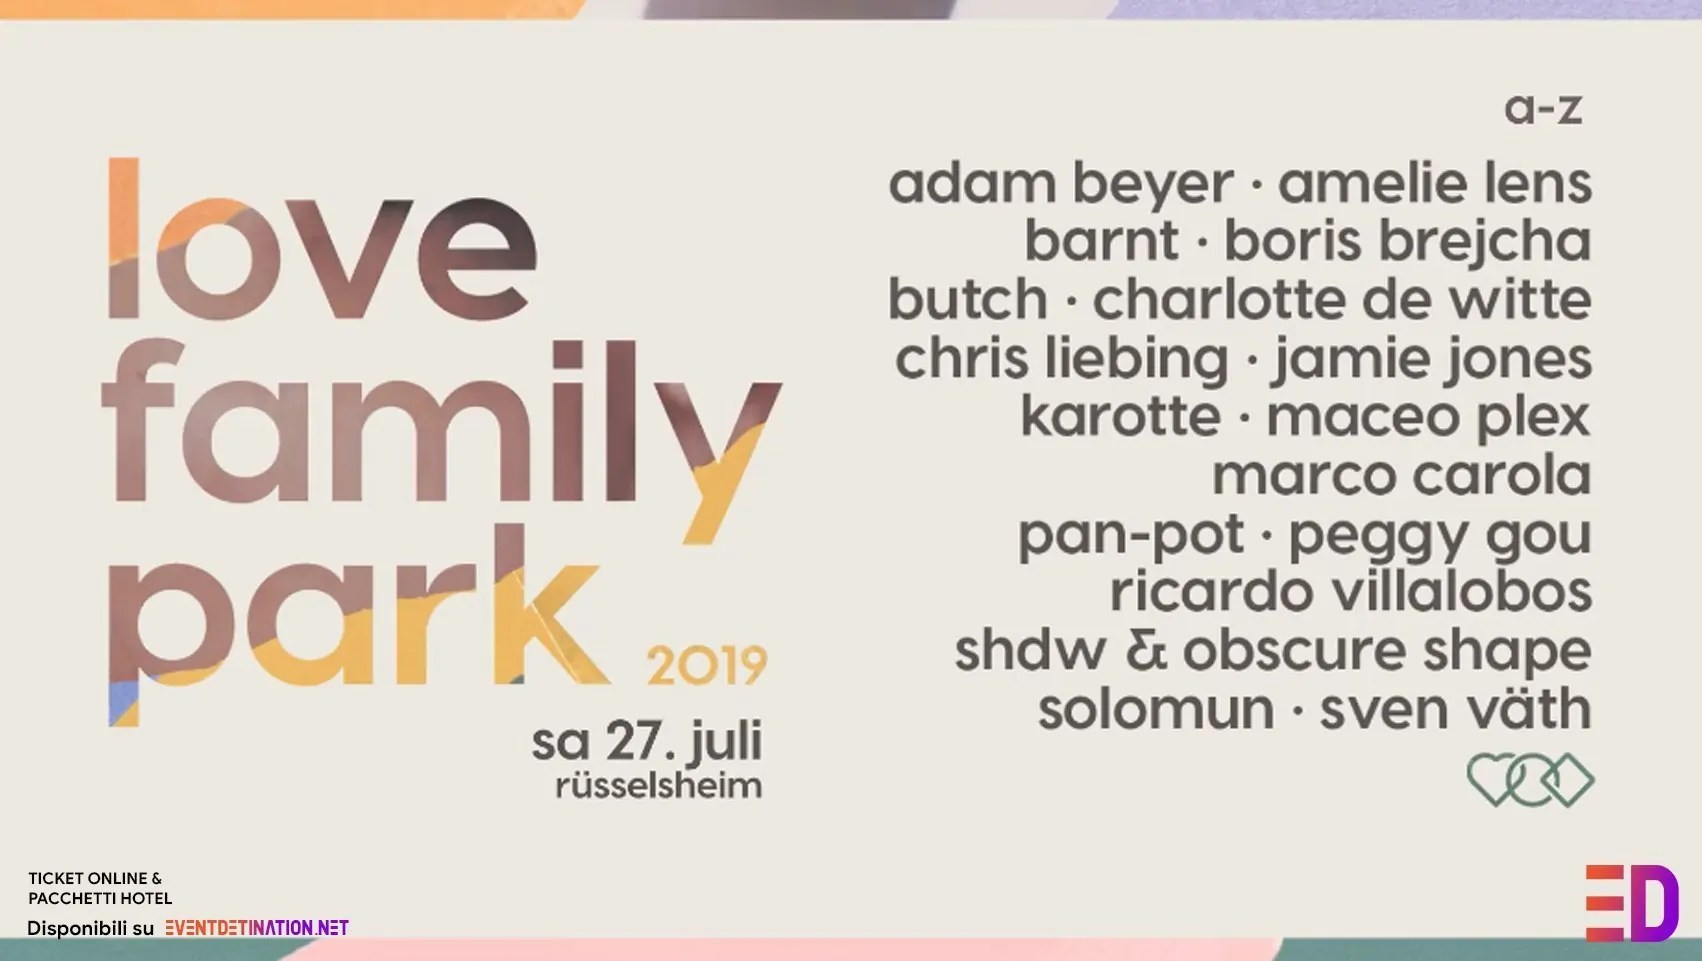 Love Family Park 2019 –  Domenica 27 Luglio 2019 – Mainvorland Rüsselsheim   Ticket e Pacchetti Hotel